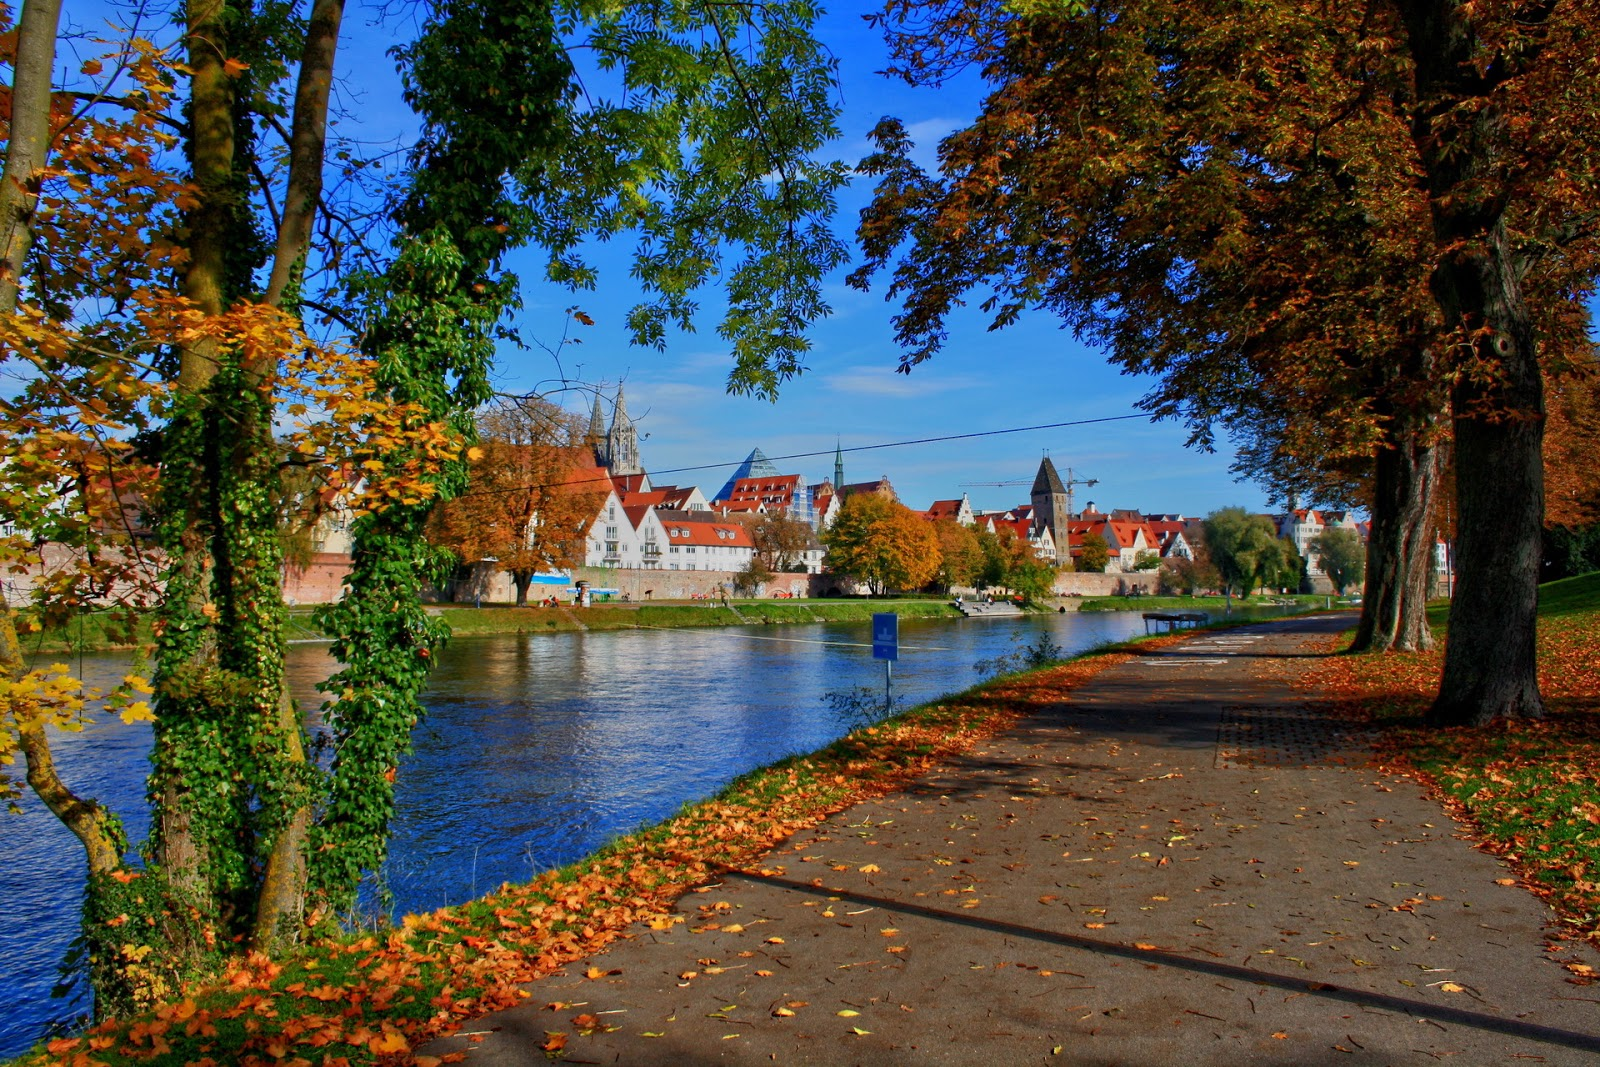 Bavaria Germany In Autumn 1600x1067 Download Hd Wallpaper Wallpapertip